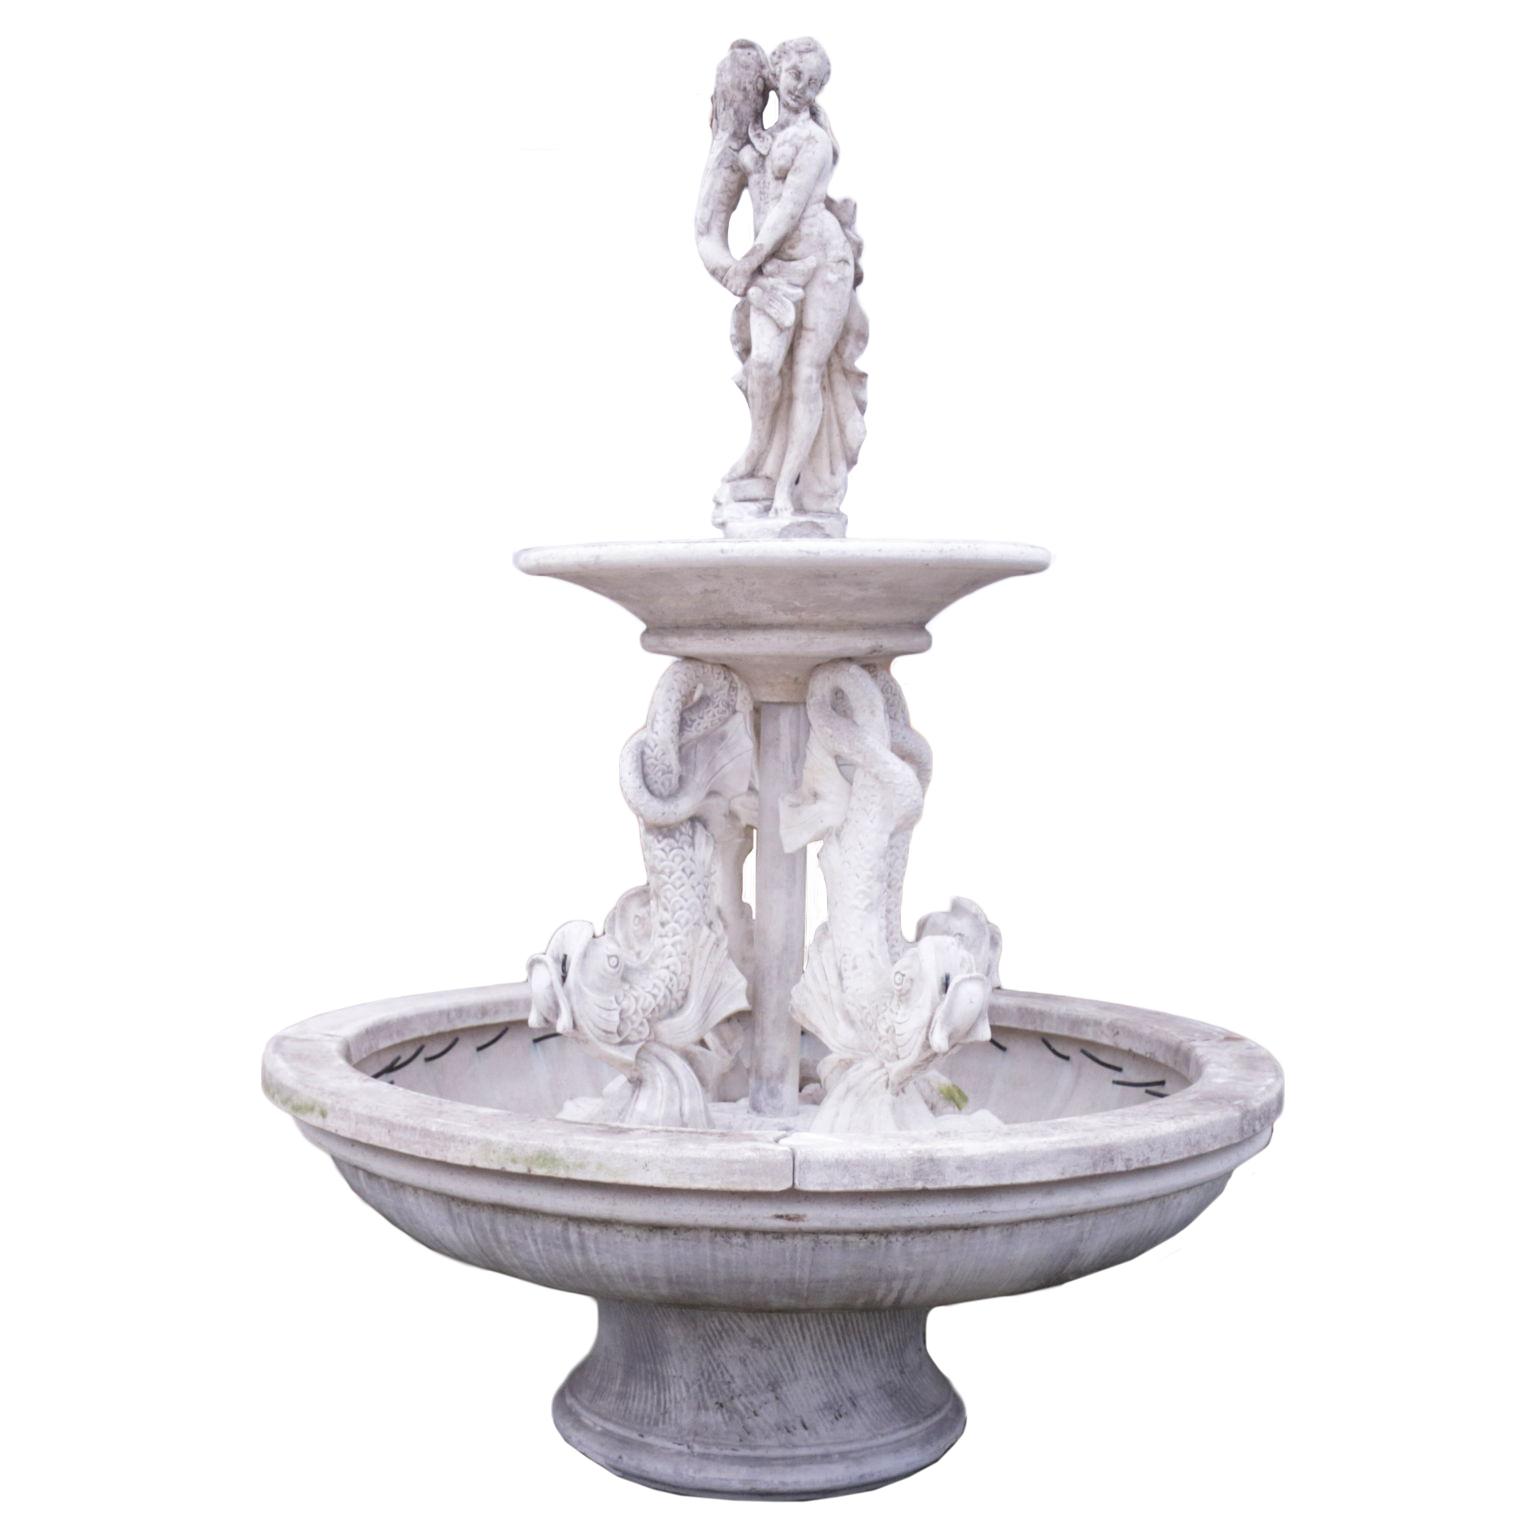 Fontana da giardino pietre e arredi giardino for Arredi antiquariato